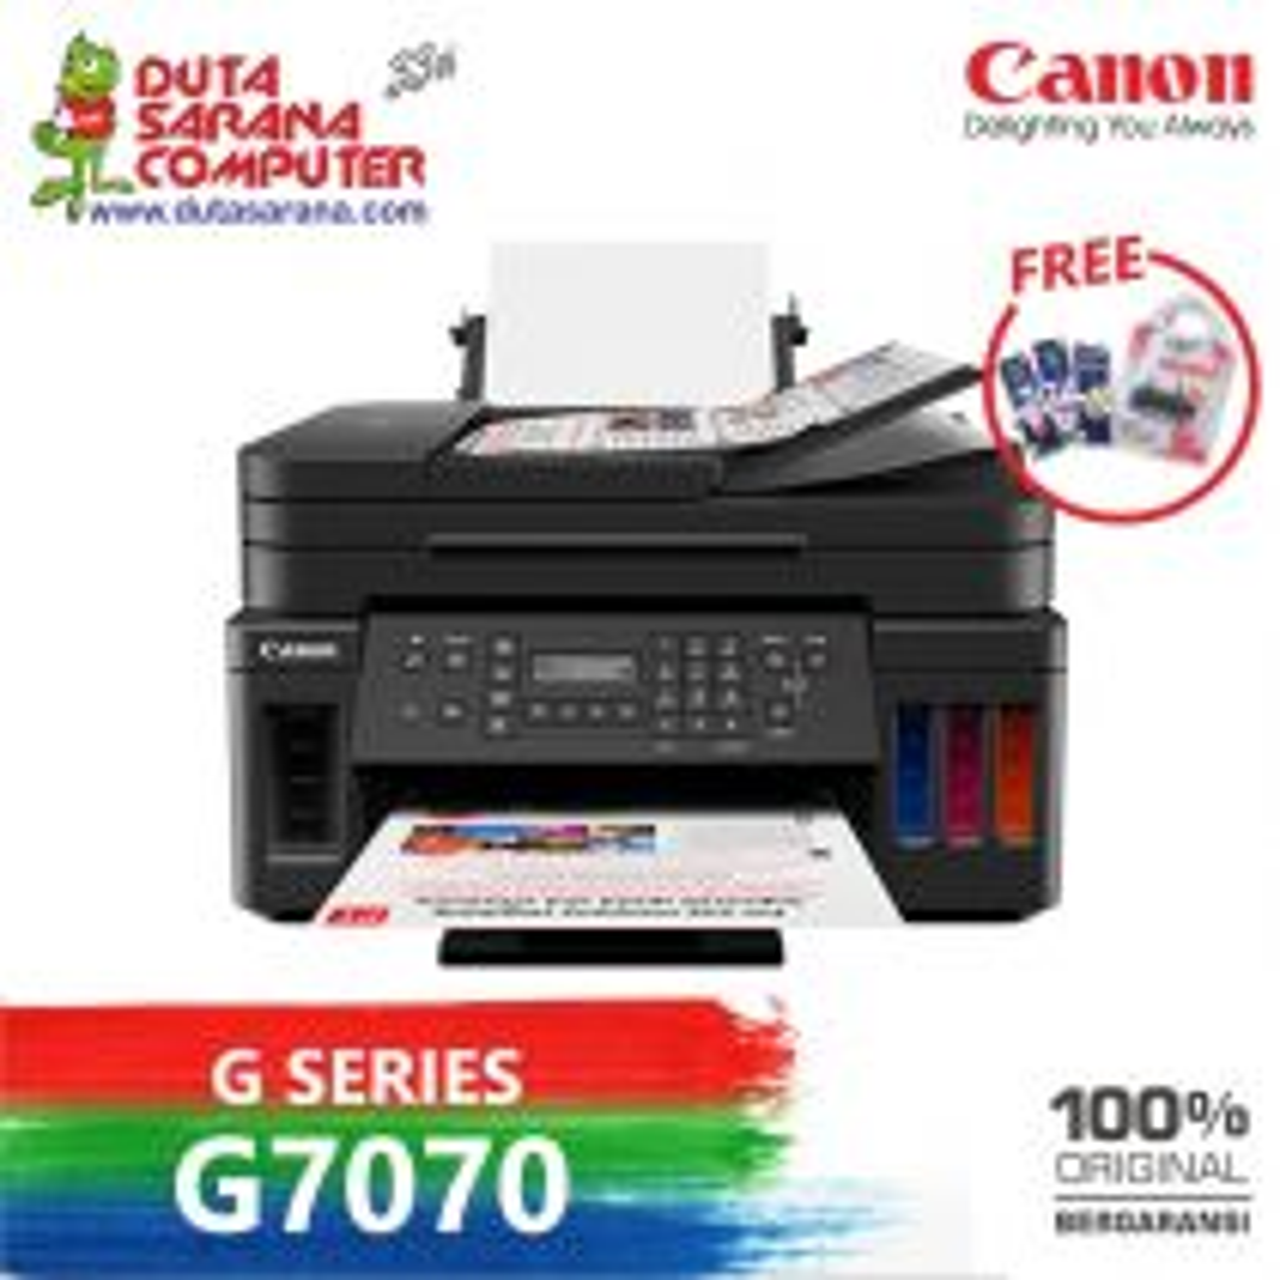 Printer Canon Pixma G7070 Print Scan Copy Wifi Adf Duplex ARS MIN LAN